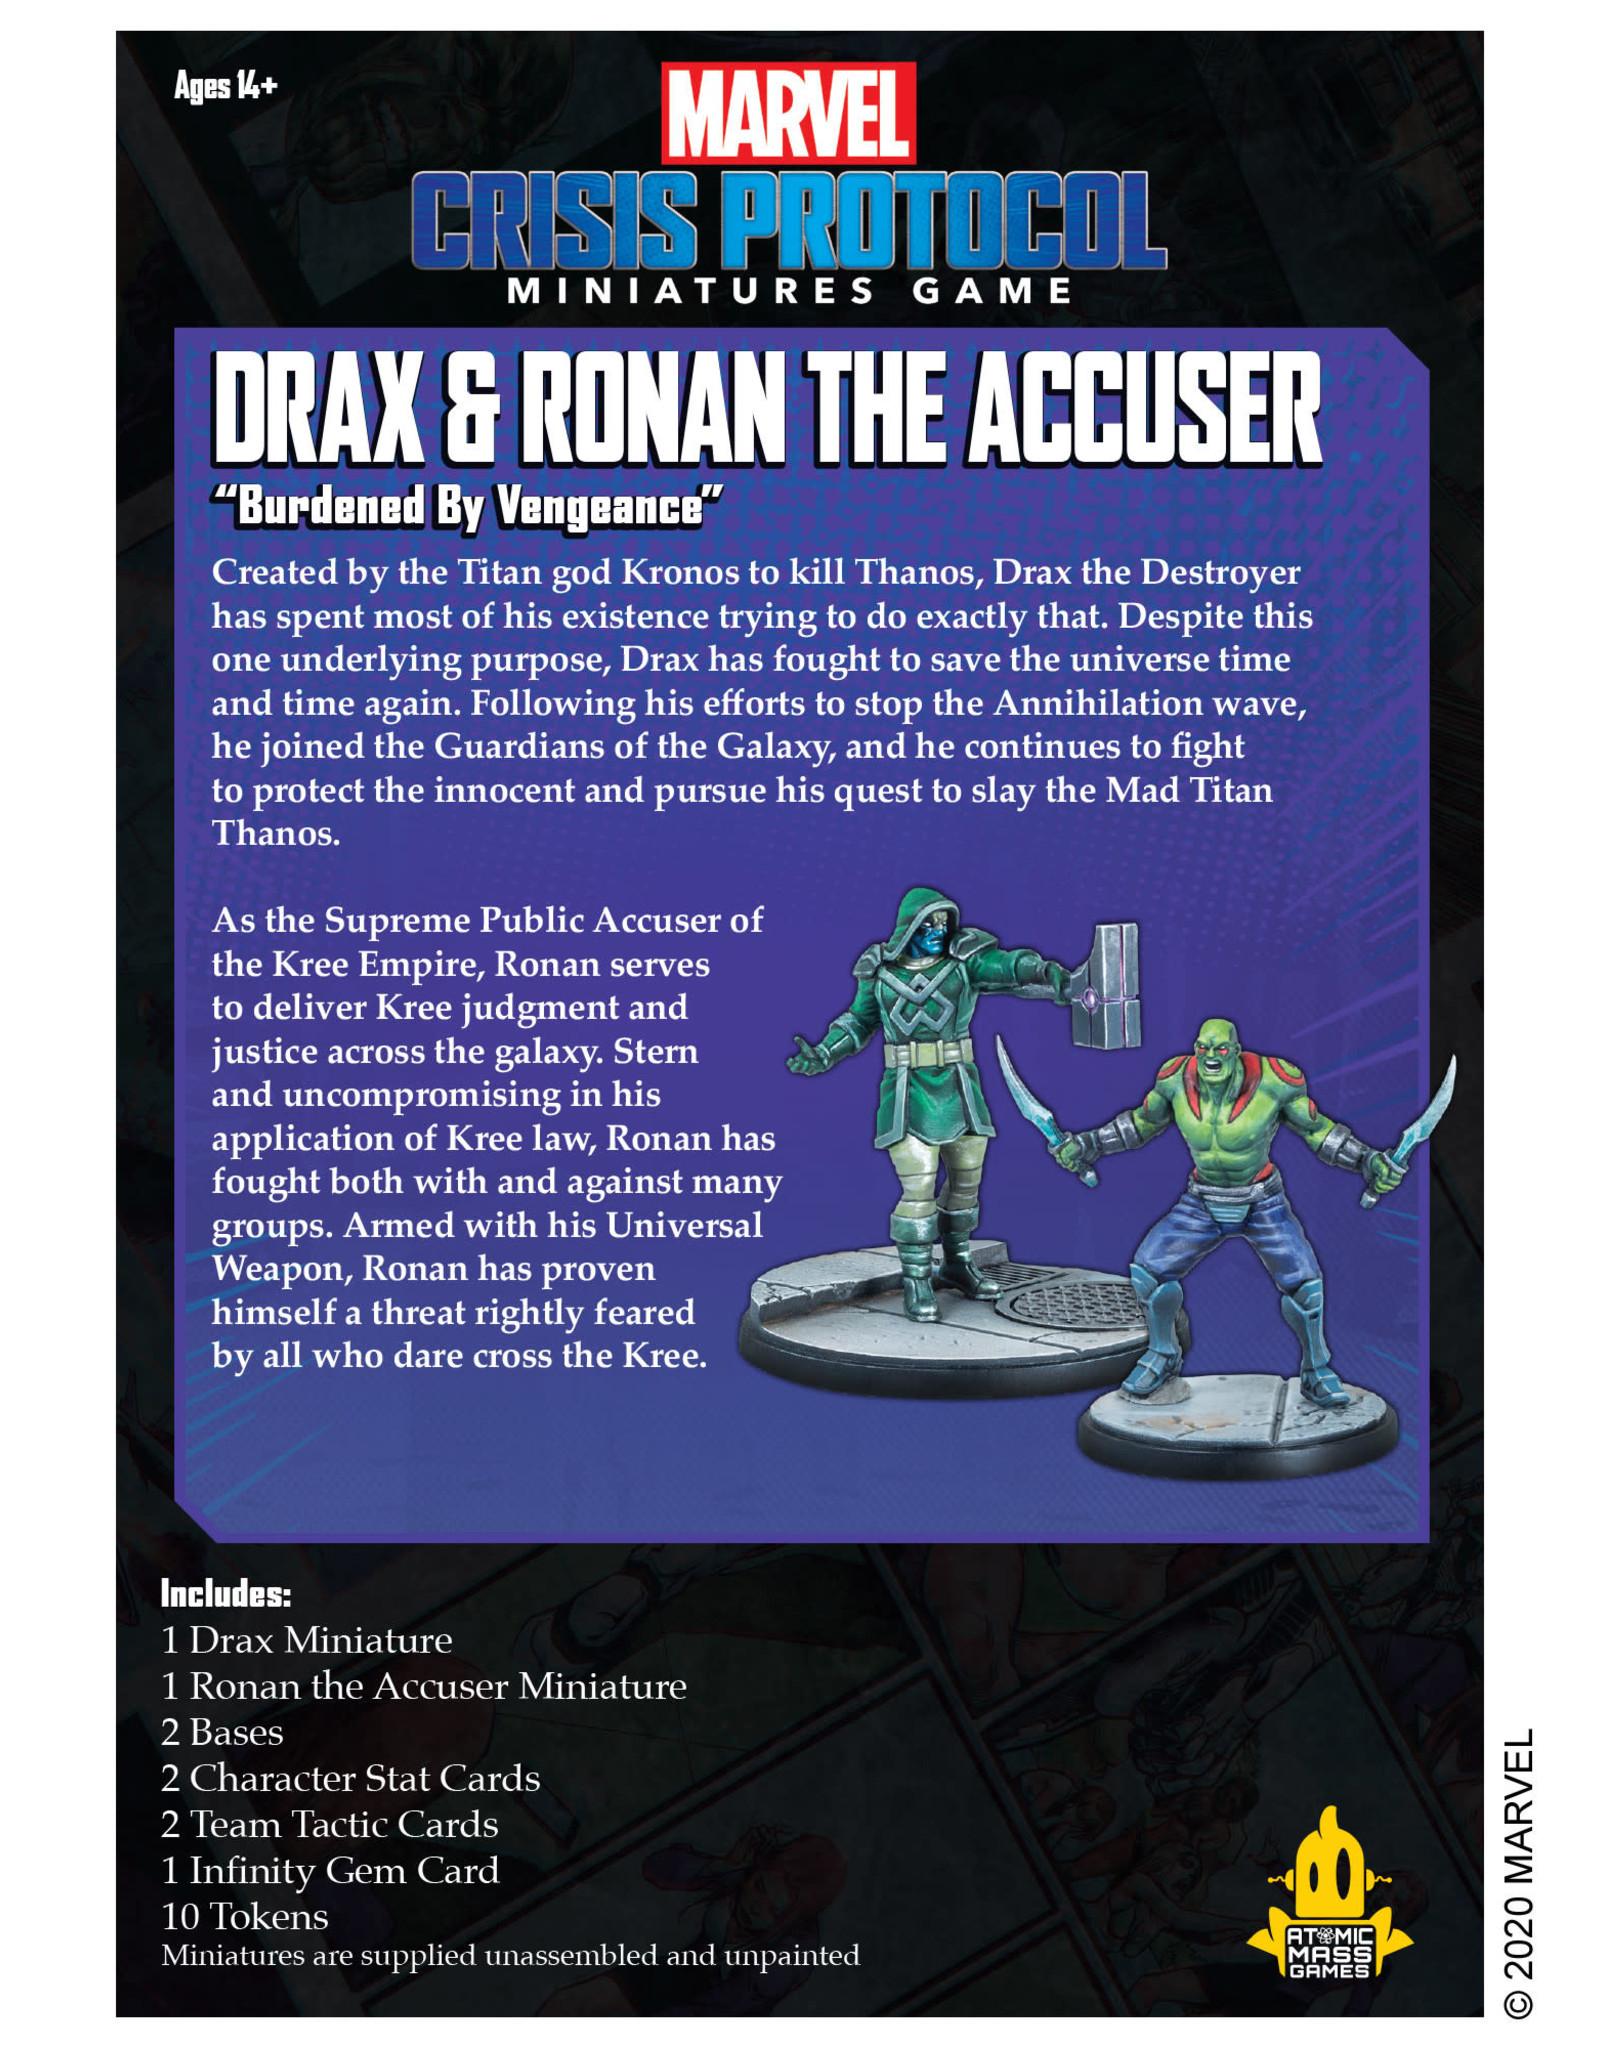 Atomic Mass Marvel Crisis Protocol: Drax and Ronan the Accuser